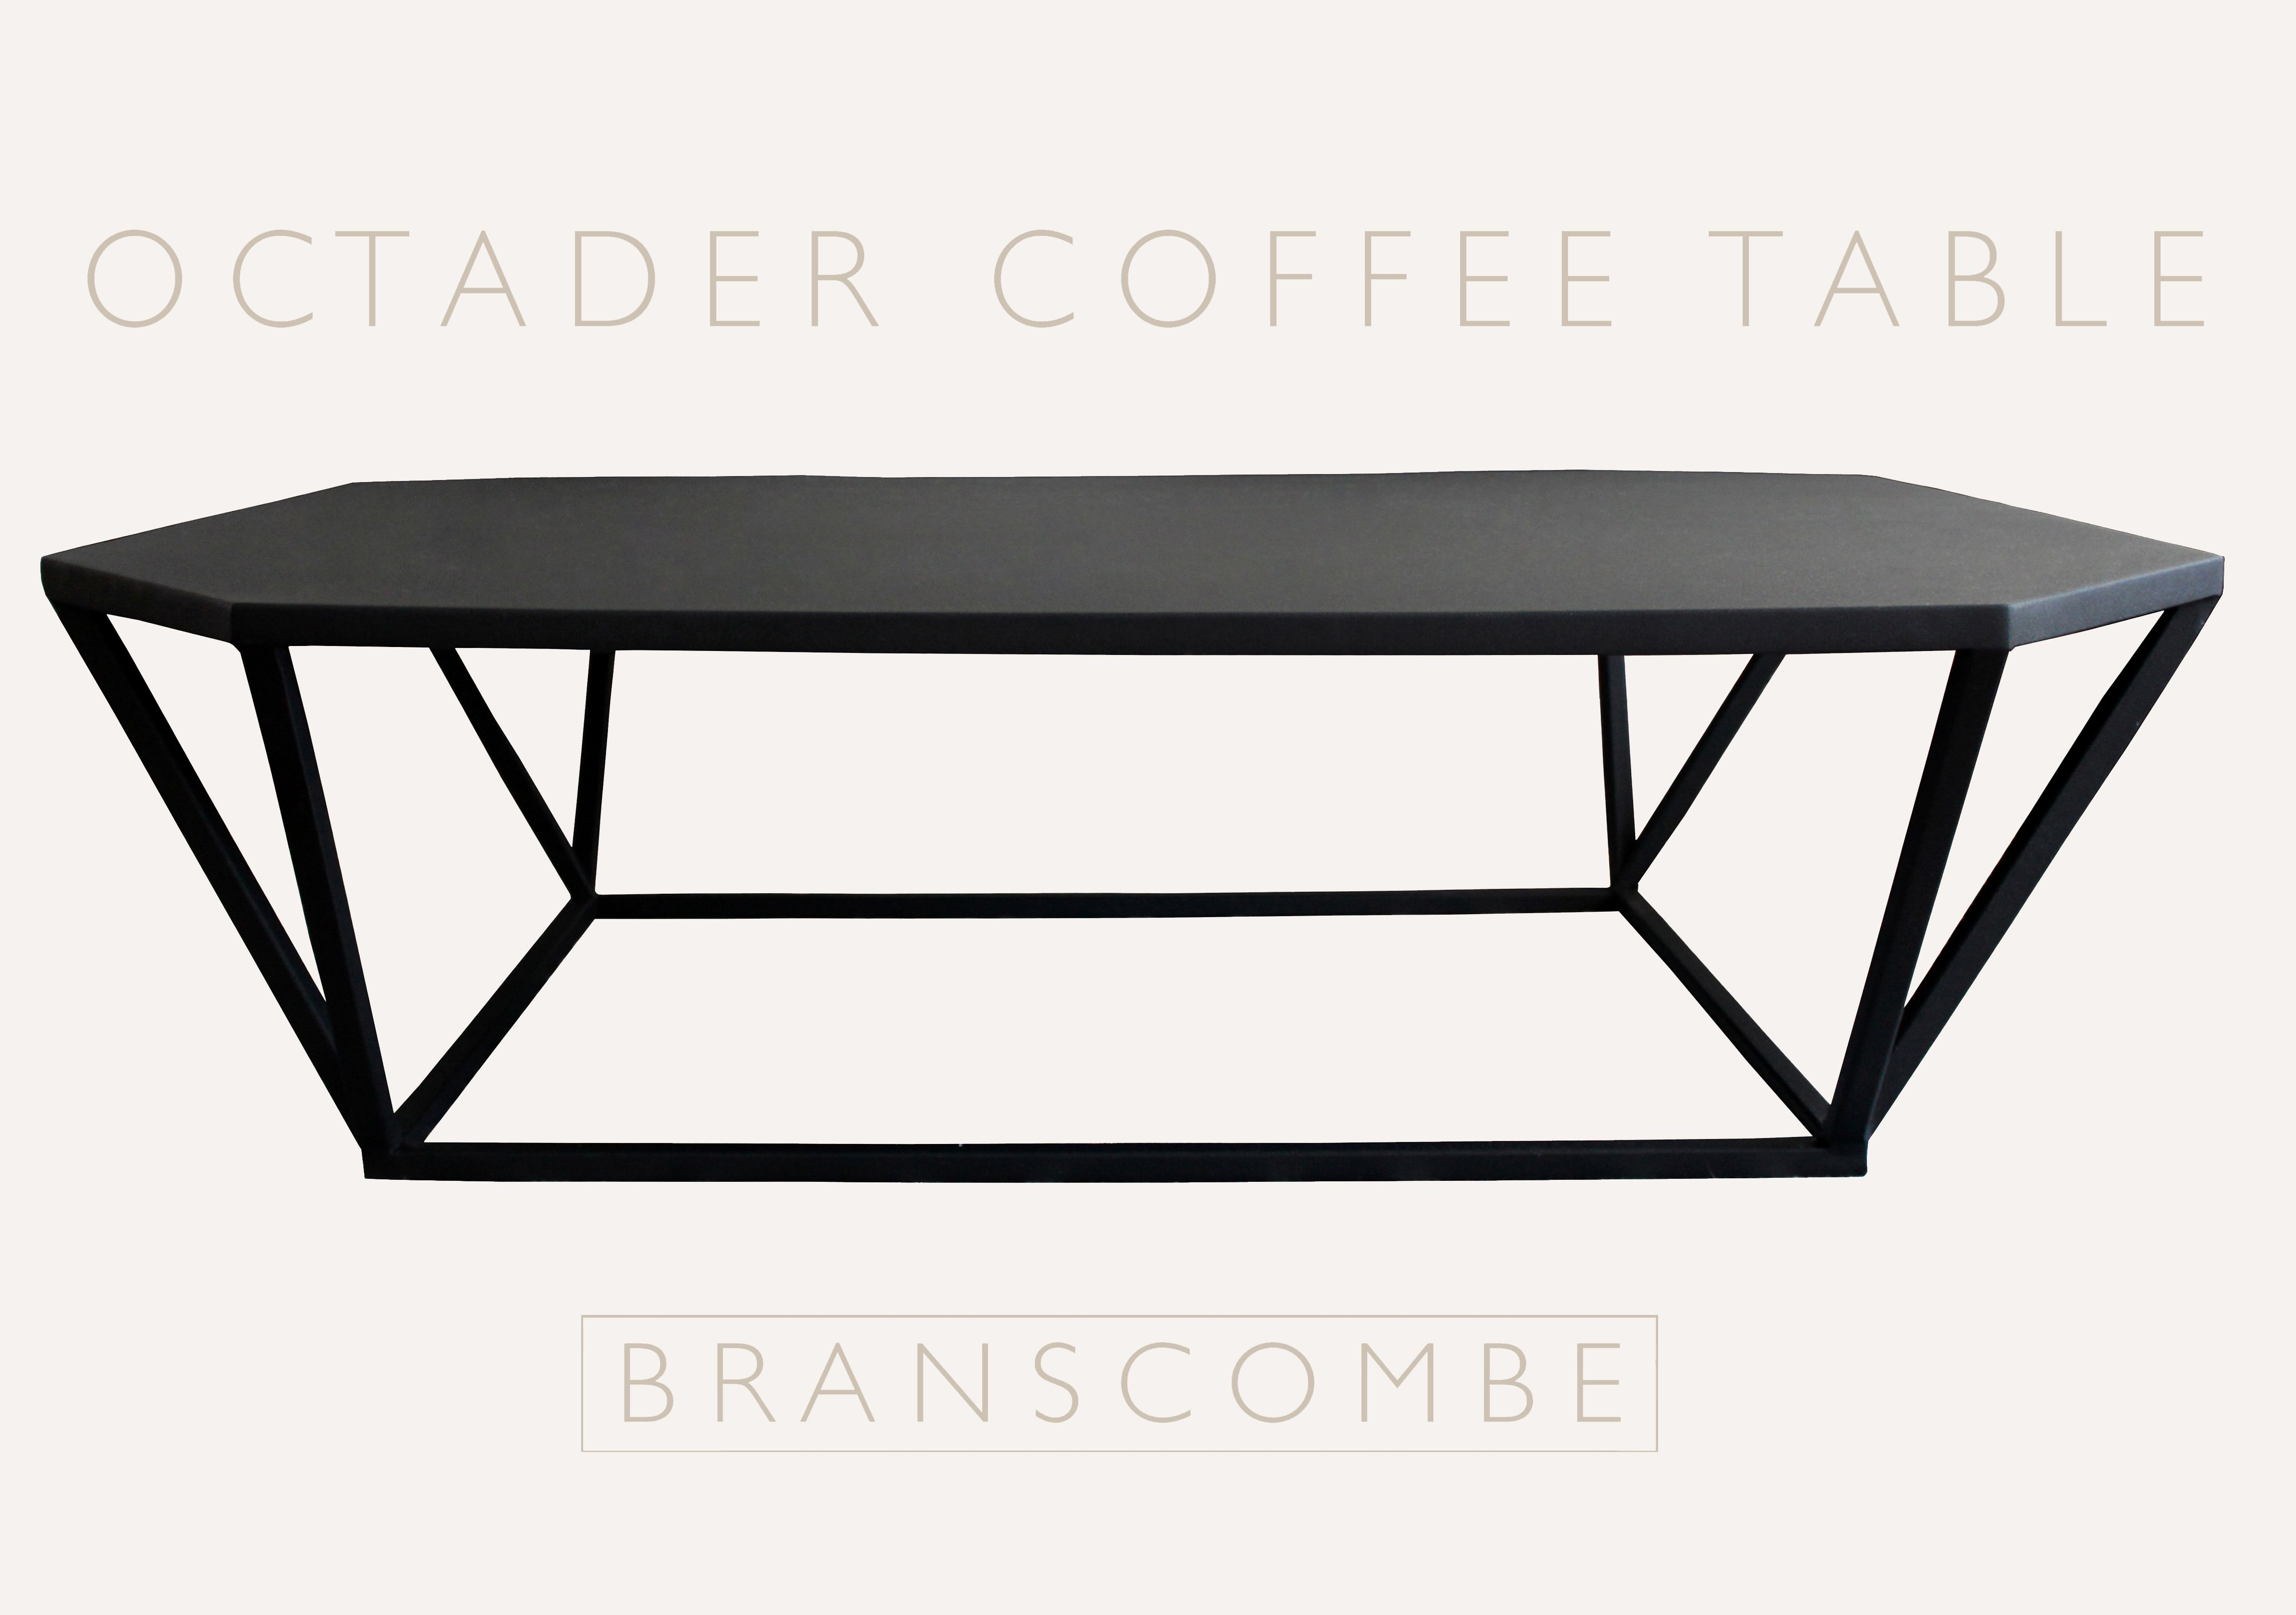 Octader Coffee Table Coffee Table Furniture Custom Furniture [ 3240 x 4607 Pixel ]